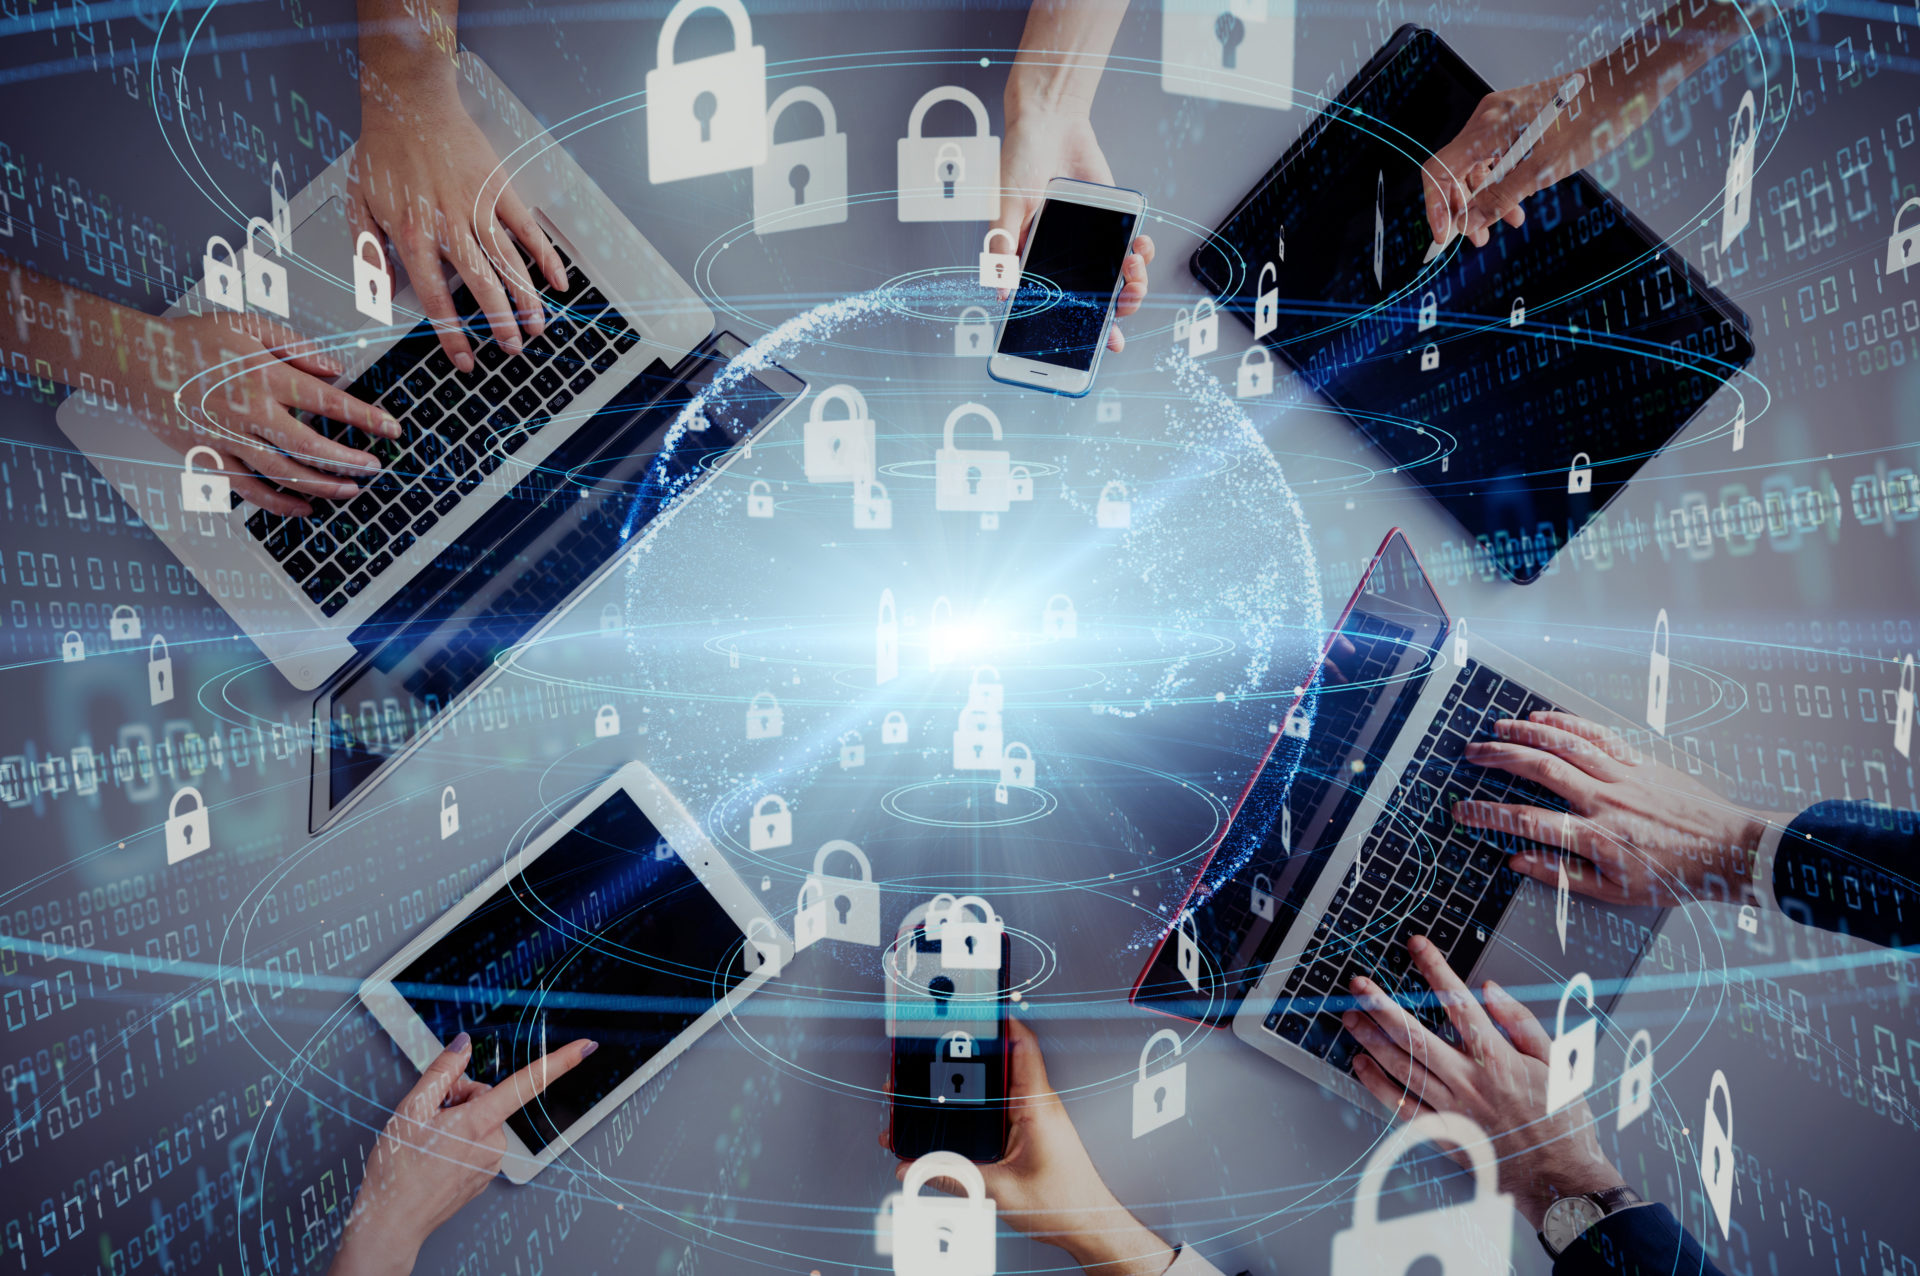 Tradesecrets - computers locked